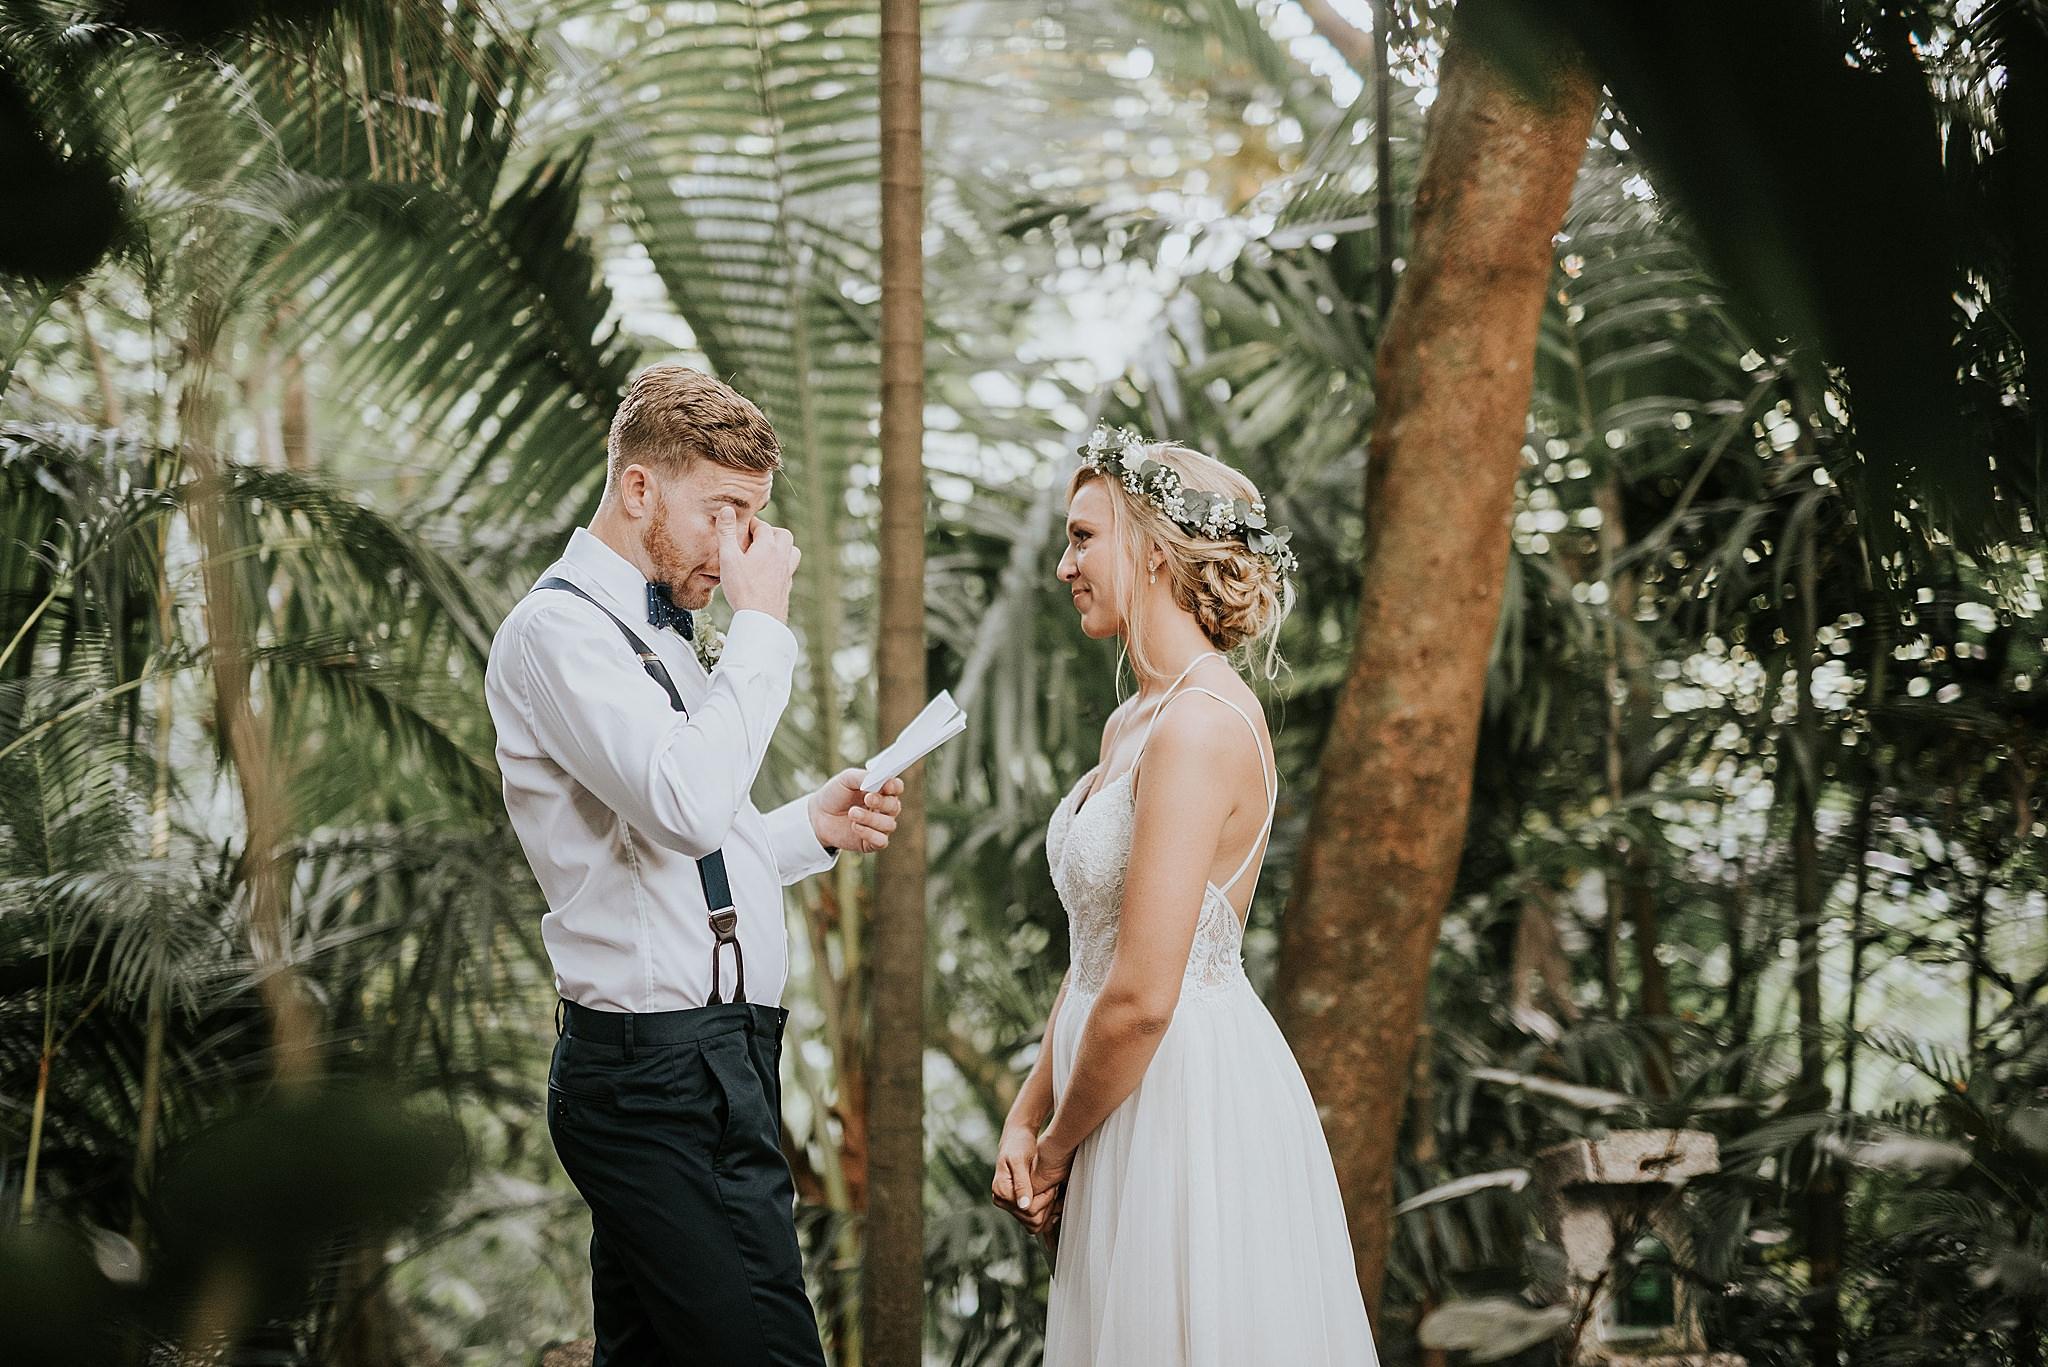 32Kelsey_jacob_beach_wedding_costa_rica_photography_0032.jpg